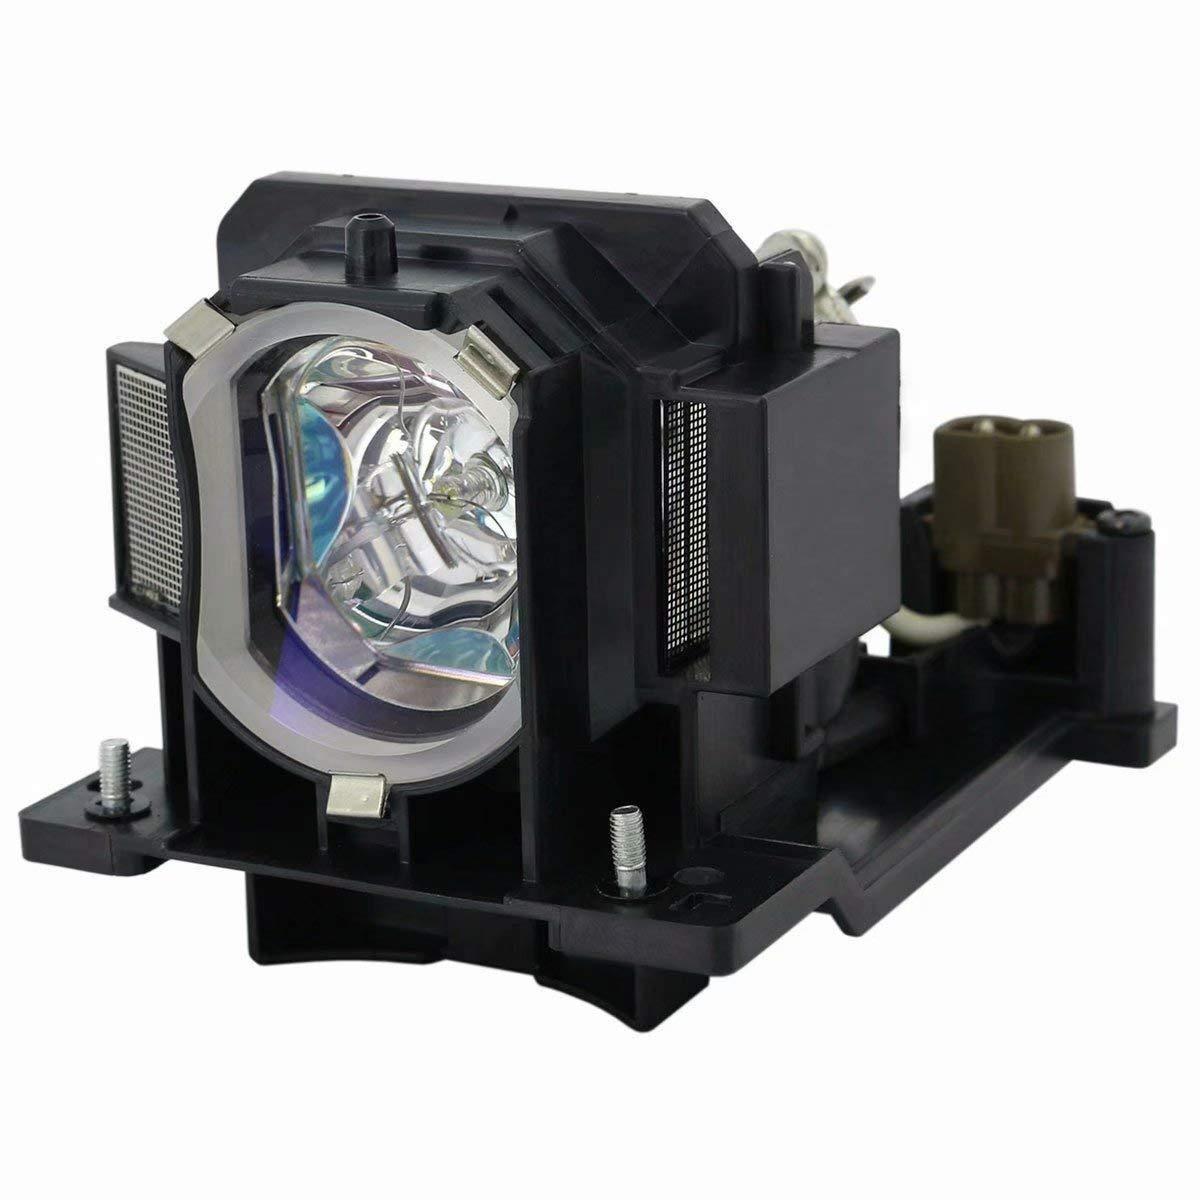 DT01091 di alta qualità sostituzione Della Lampada Del Proiettore Per Hitachi CP-AW100N CP-D10 CP-DW10 ED-AW100N ED-AW110N HCP-Q3 HCP-Q3W CP-DW1